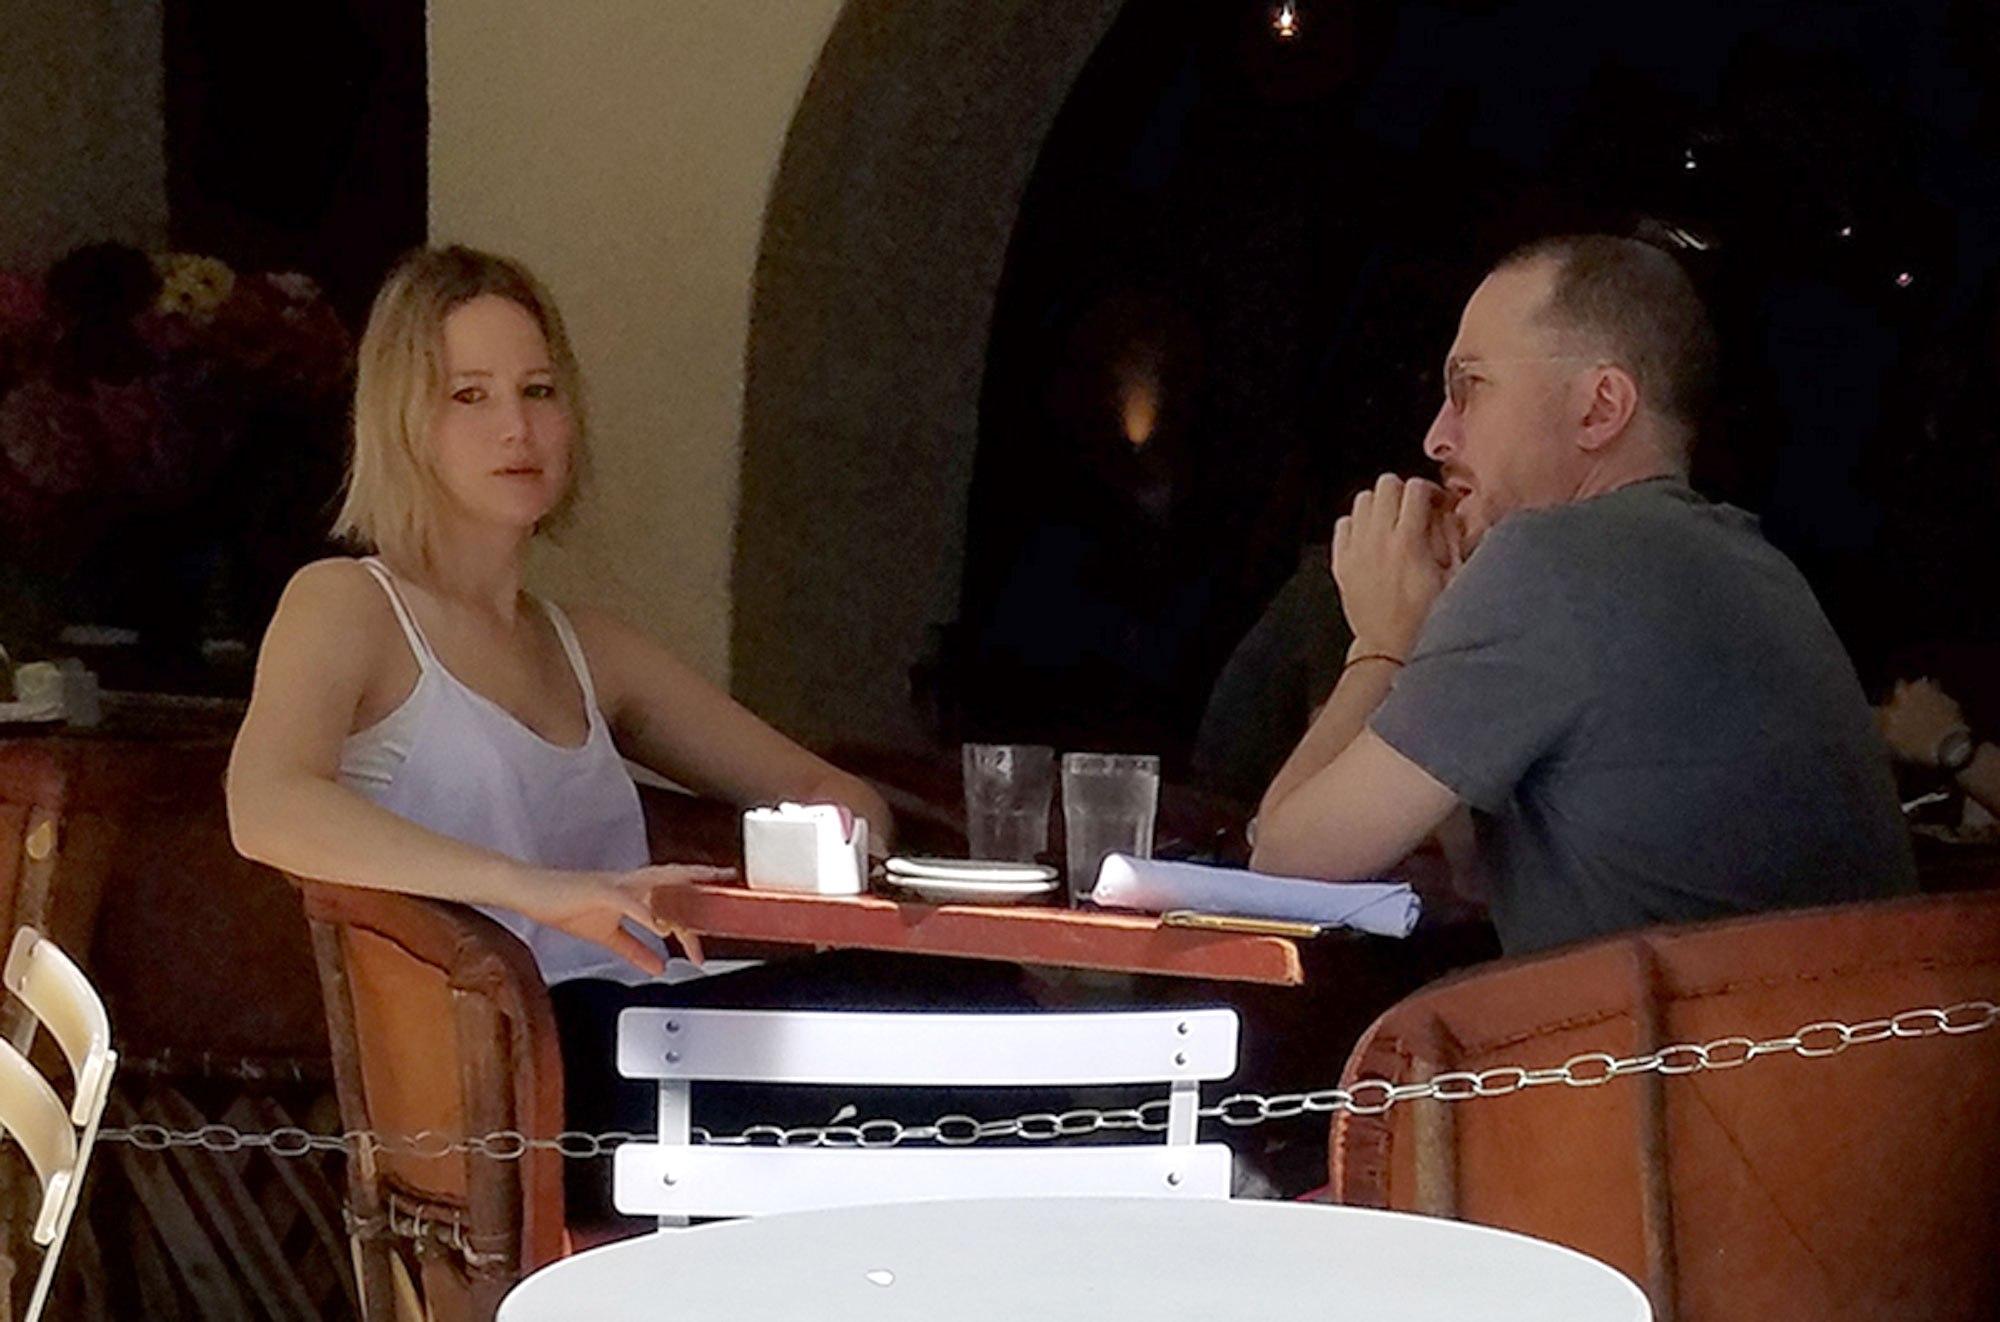 Jennifer Lawrence Darren Aronofsky MovieSpoon.com